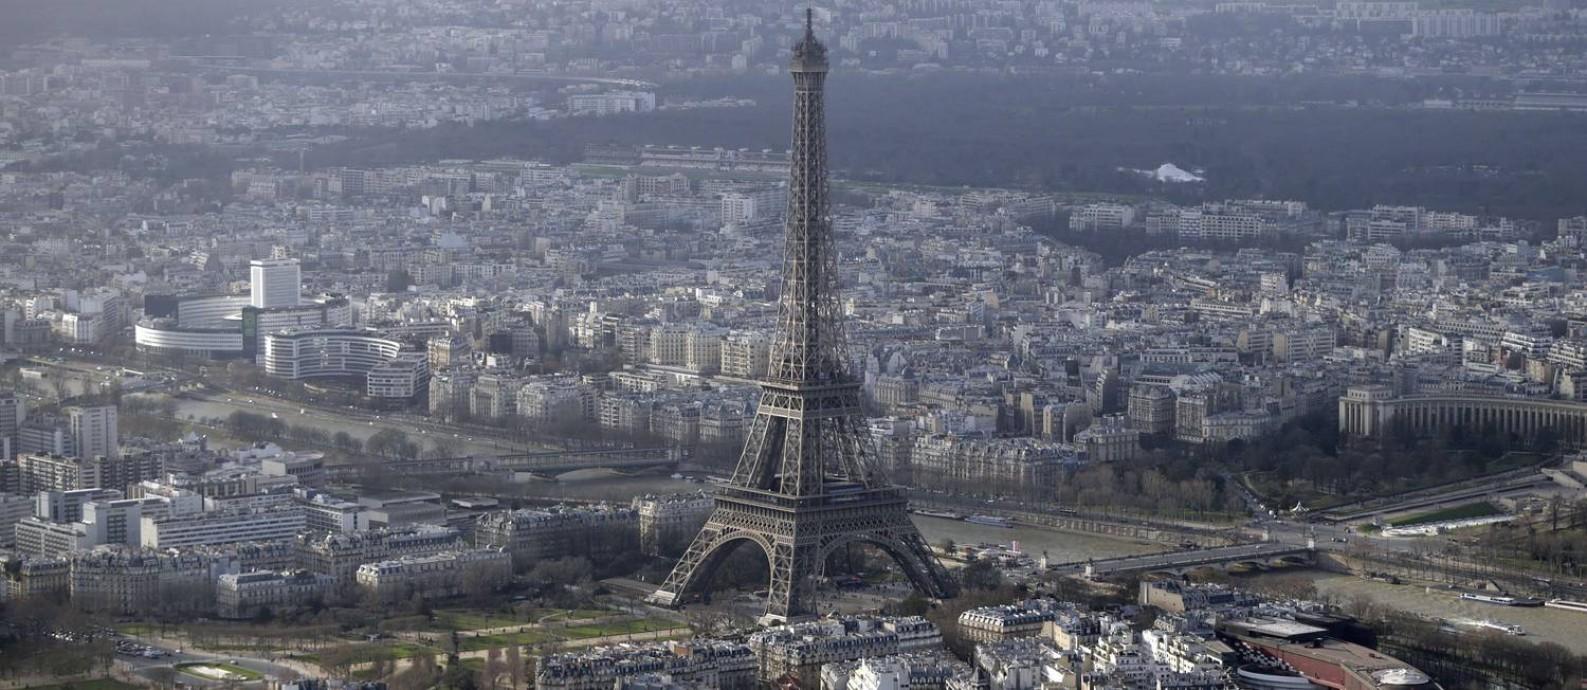 Vista aérea de Paris, com a Torre Eiffel em destaque Foto: KENZO TRIBOUILLARD / AFP